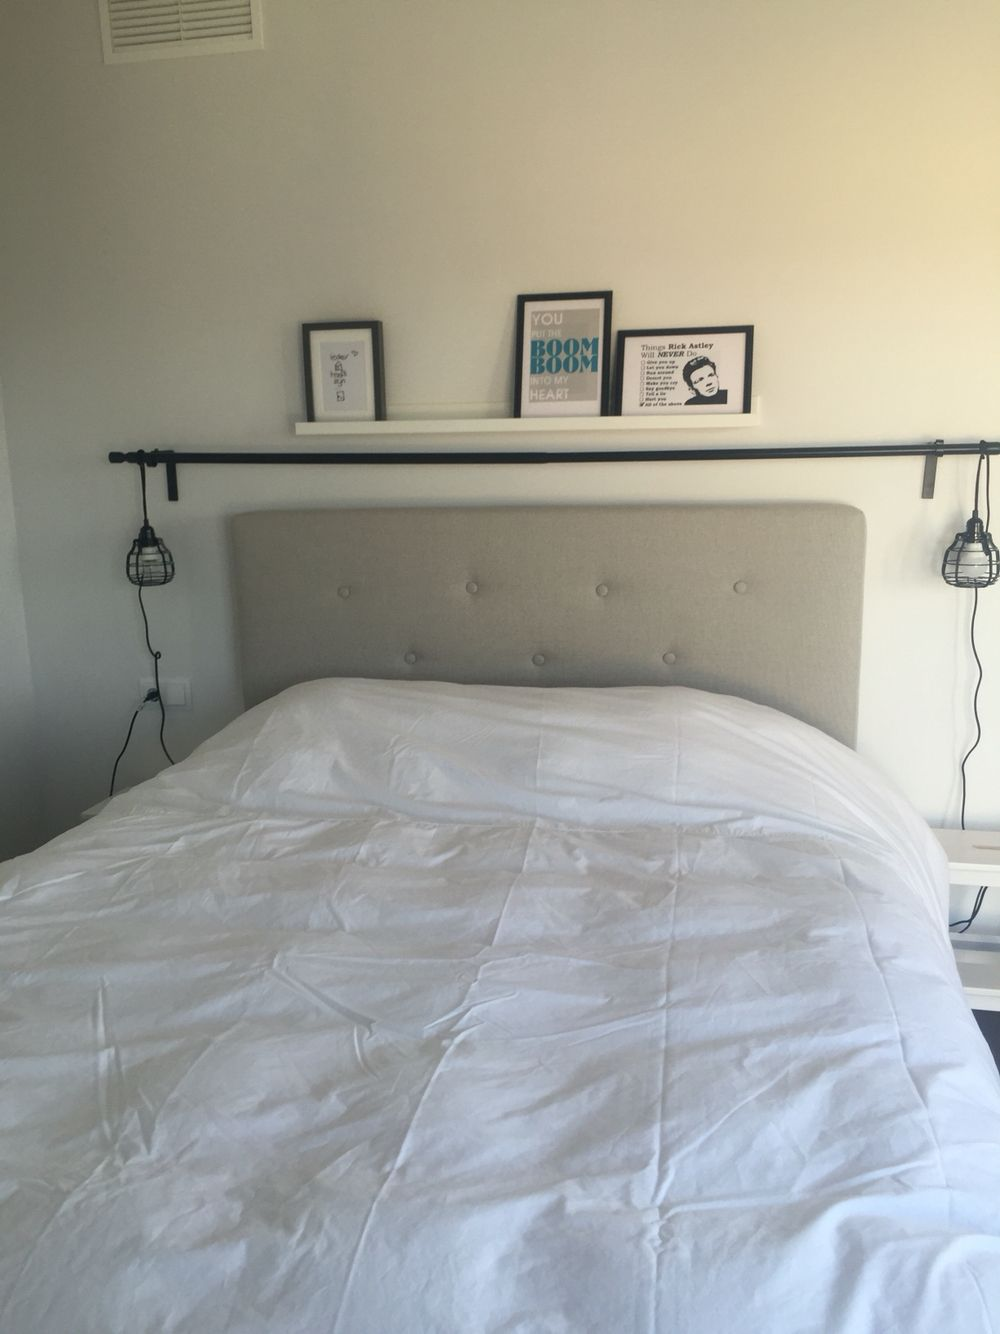 Boxspringbett ikea evenskjer  Sweet dreams #Bedroom #Ikea Evenskjer bed #HKLiving lights | Sweet ...